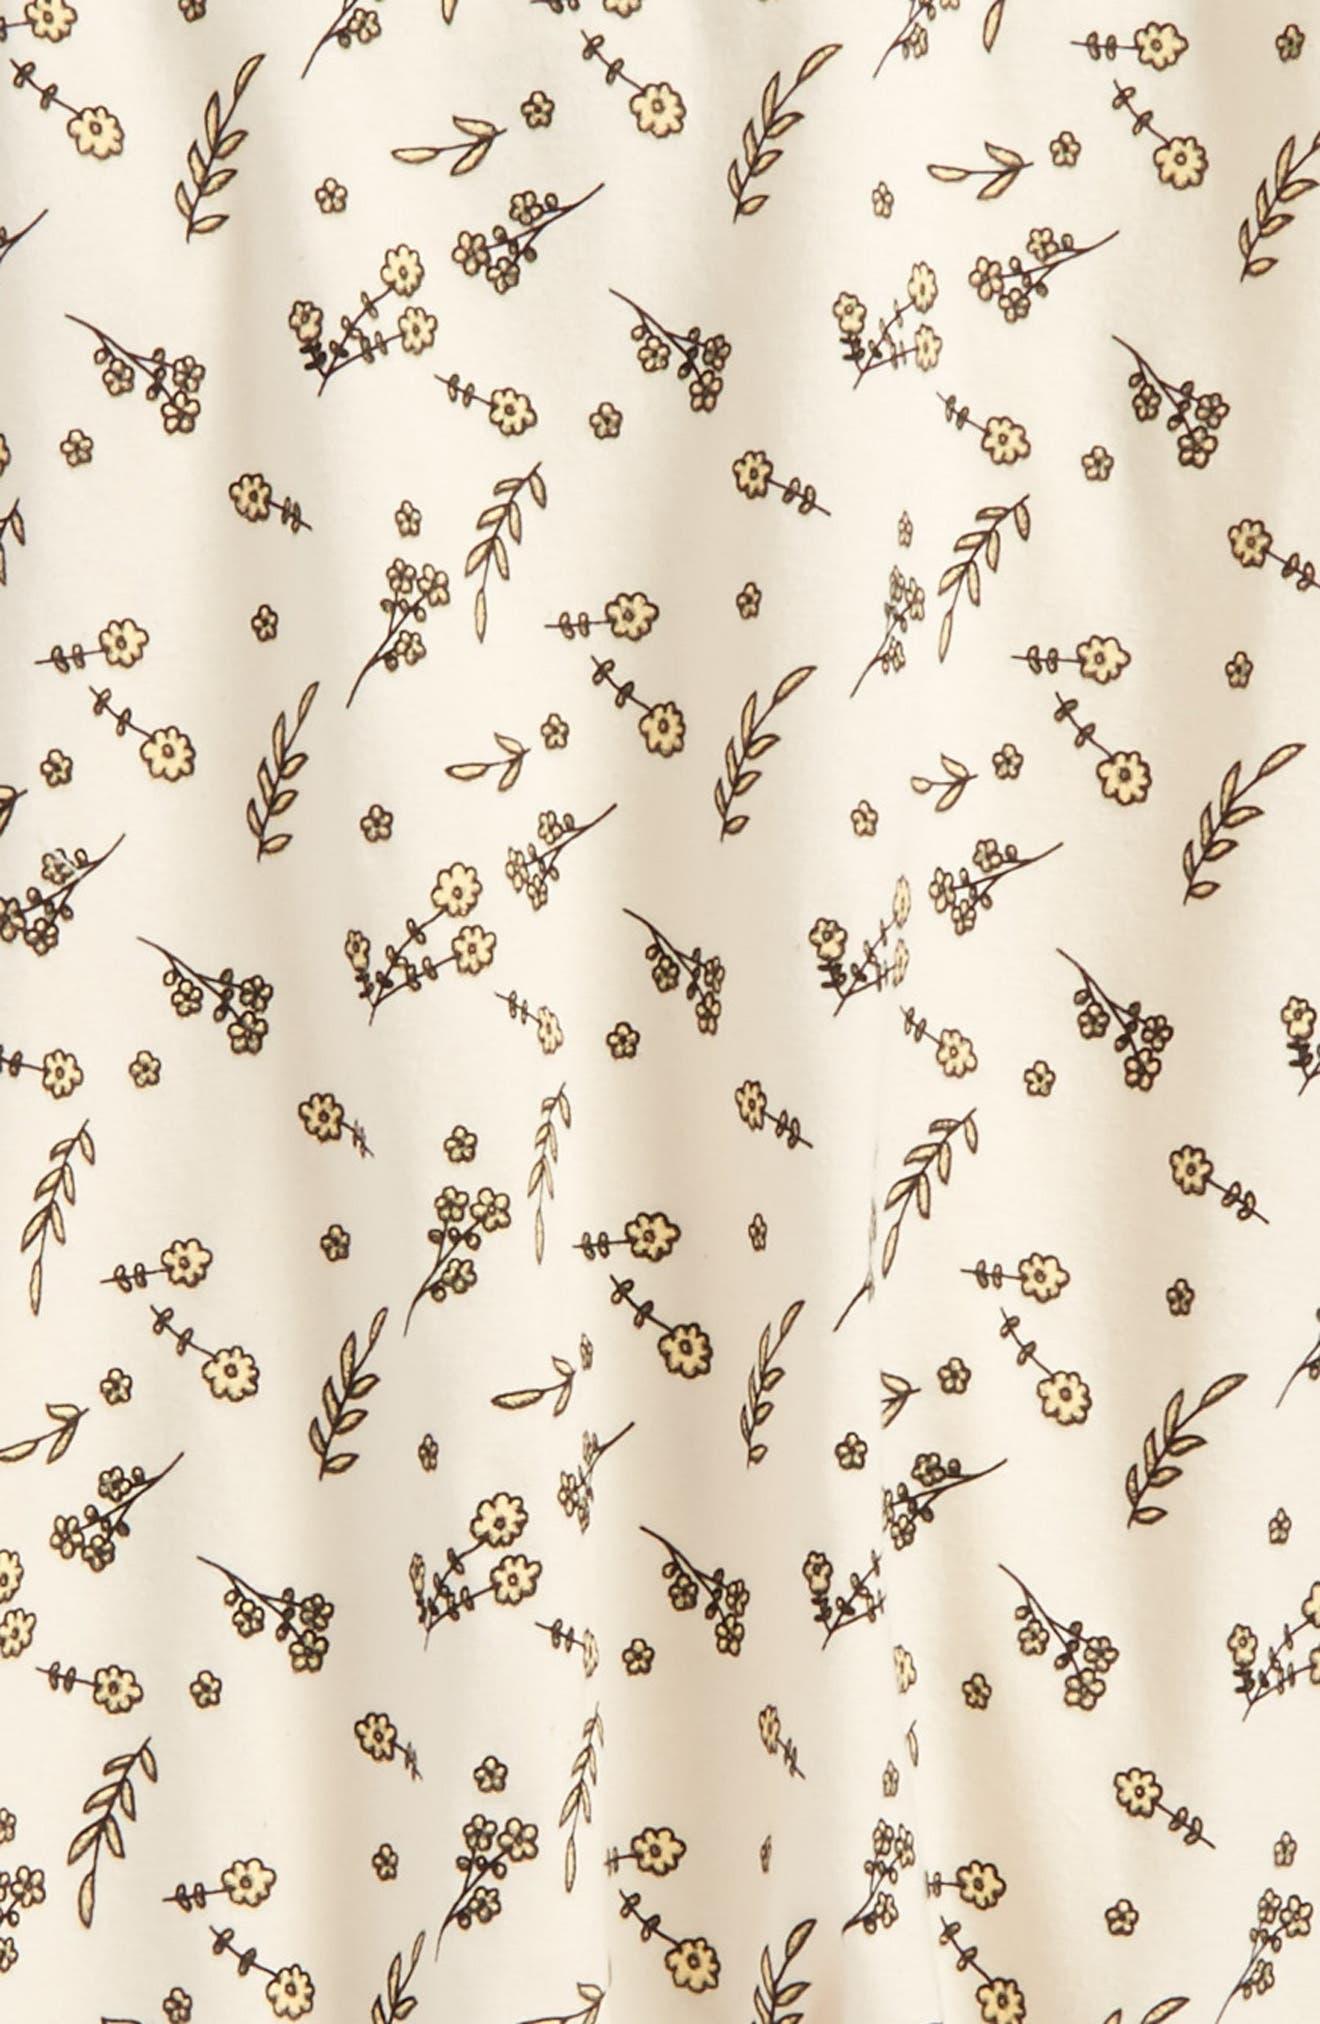 Florette Jersey Overalls,                             Alternate thumbnail 3, color,                             Ivory Floral